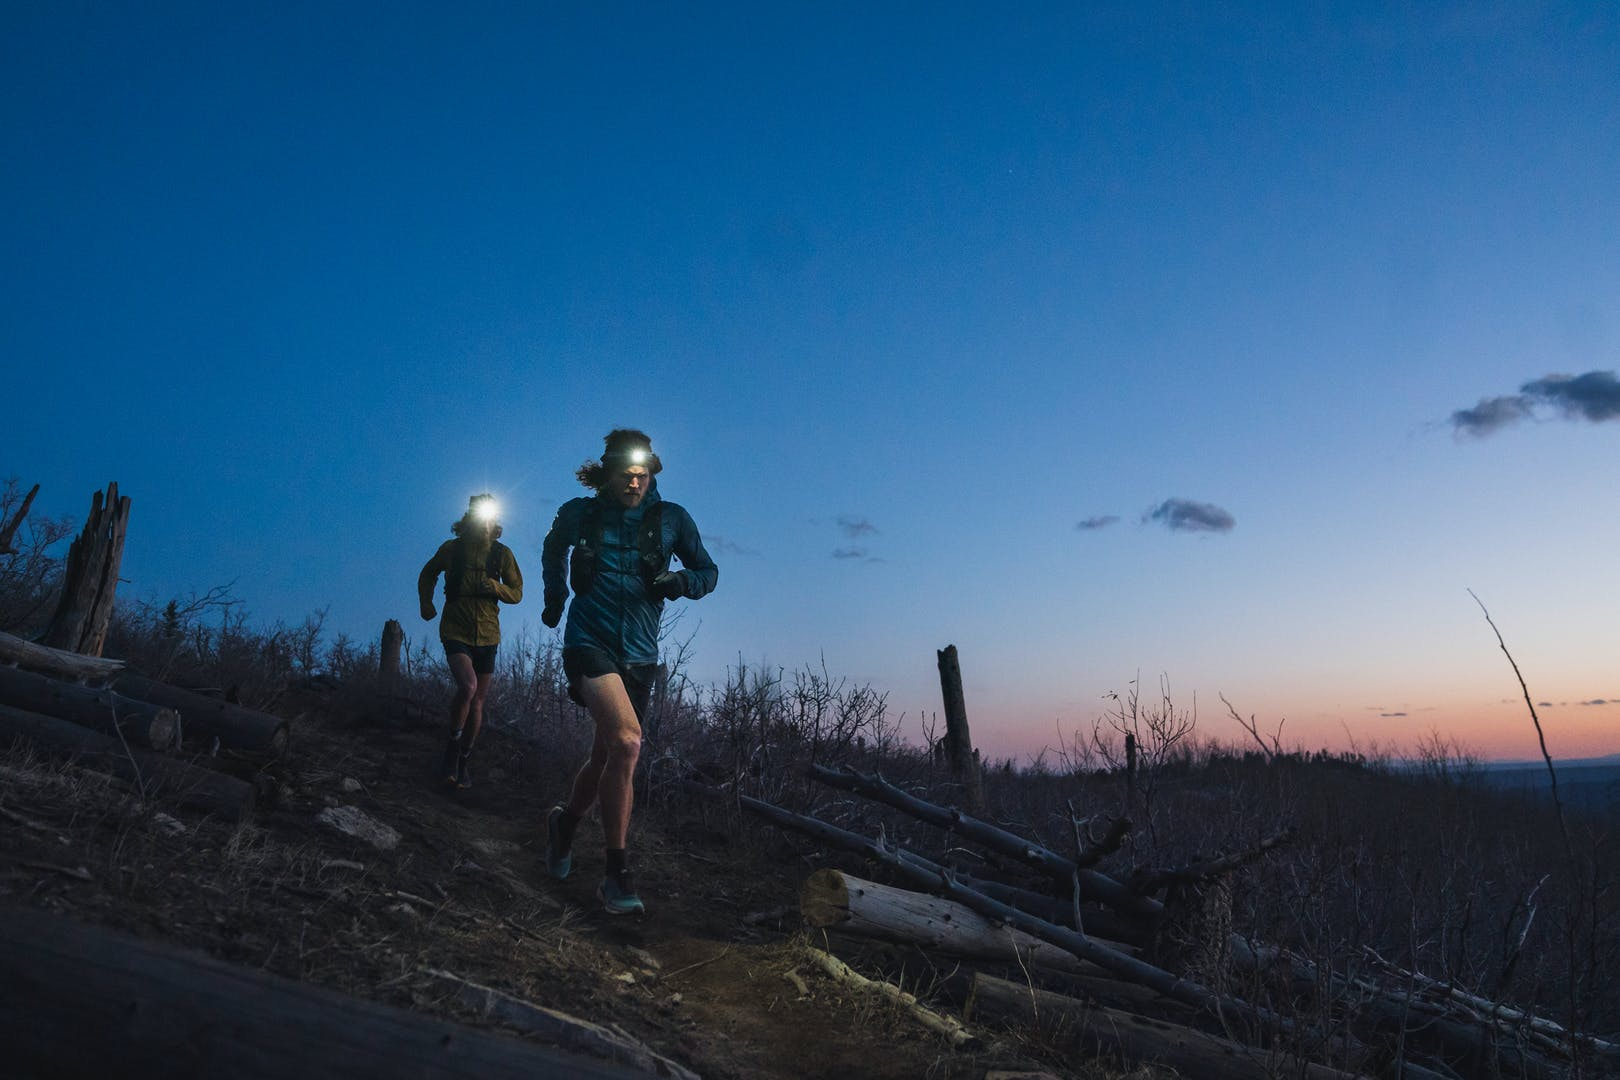 BD athletes Kyle Richardson and Joe Grant running at sunset